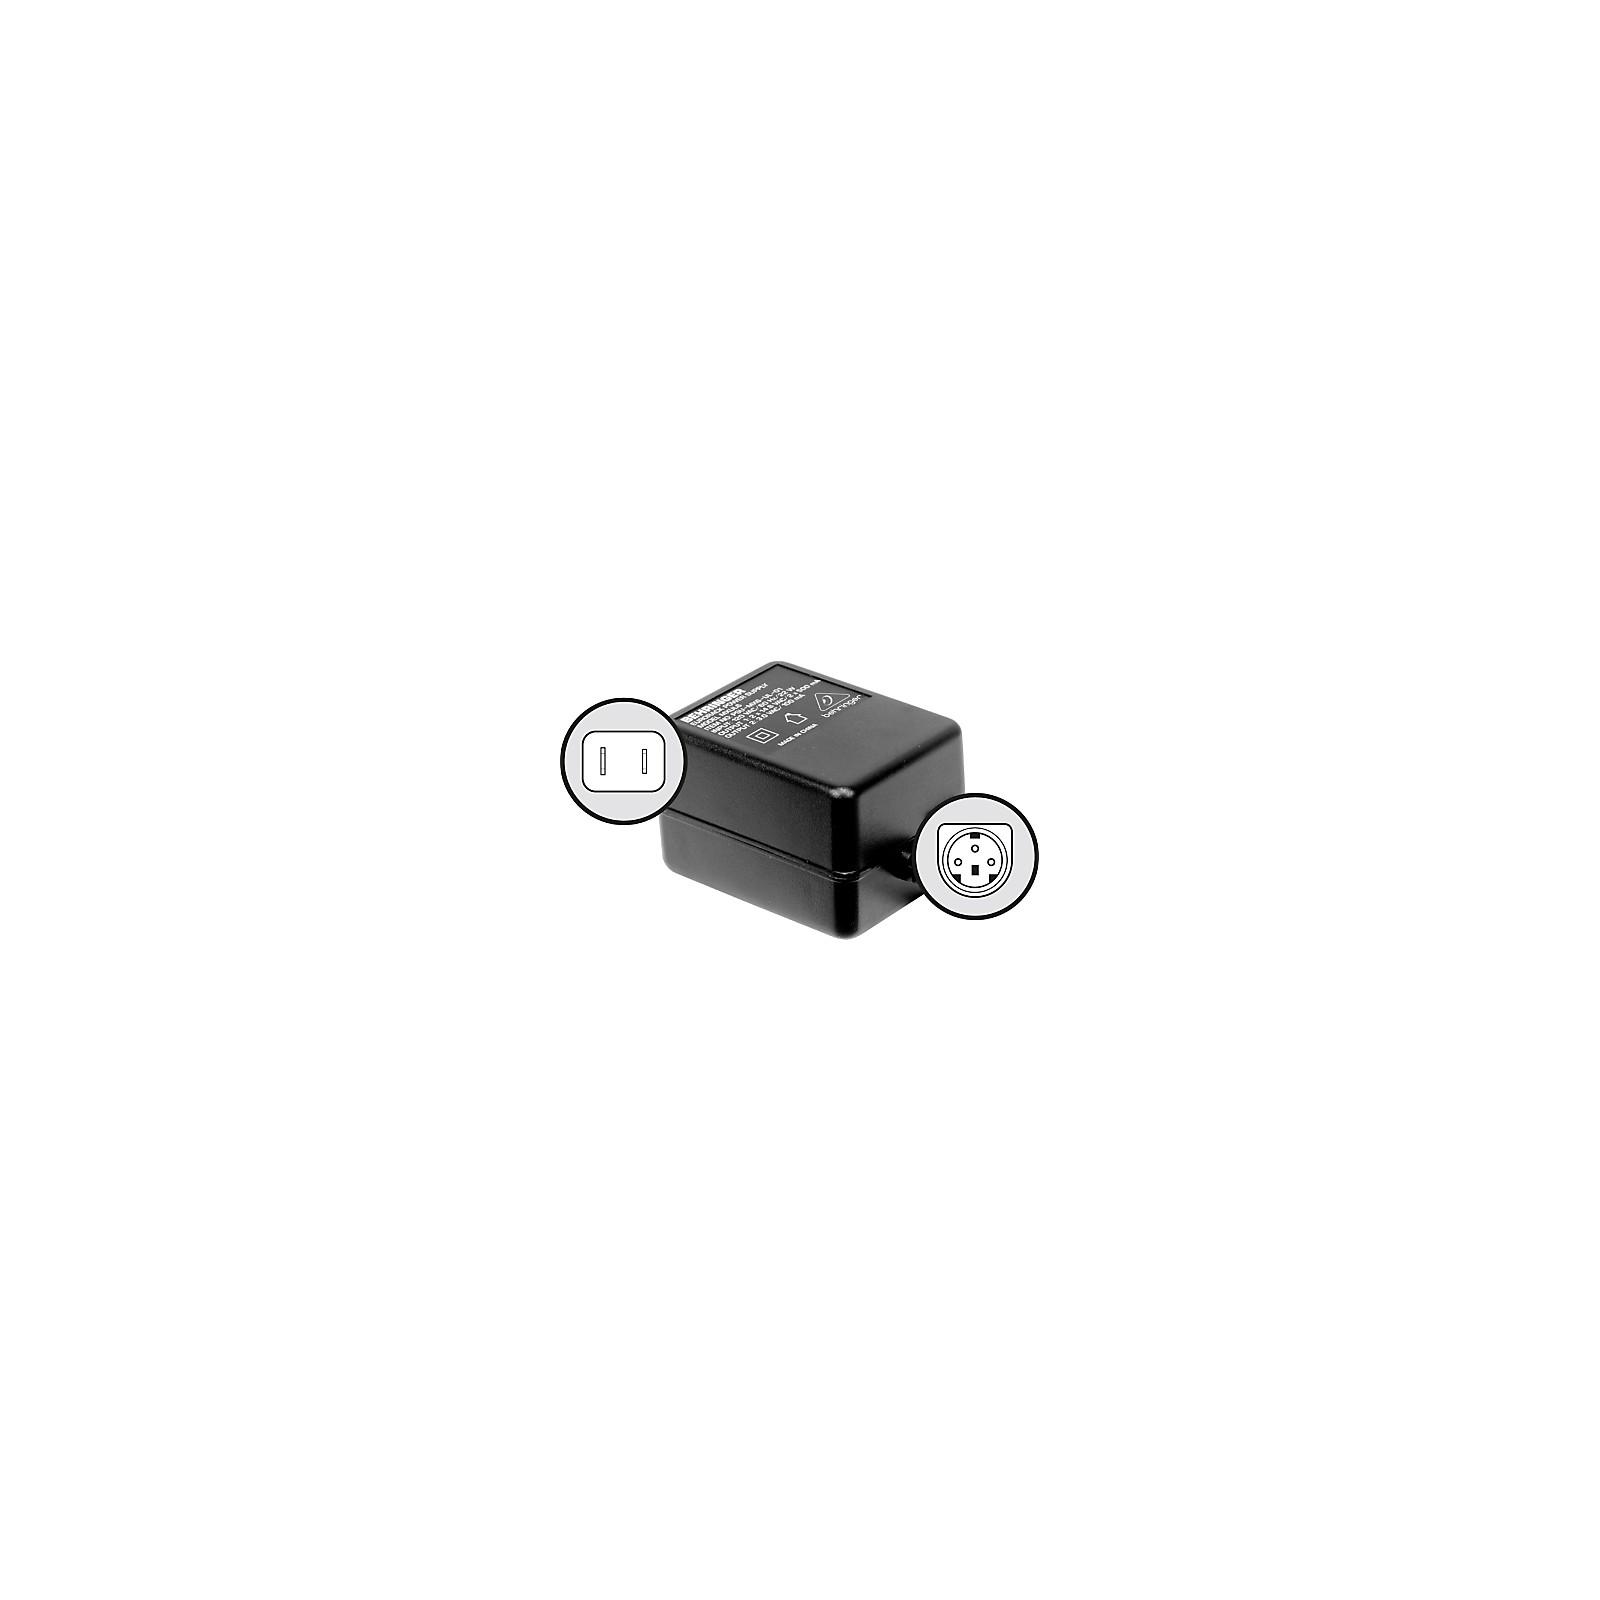 Behringer PSU6-UL 120V Power Supply